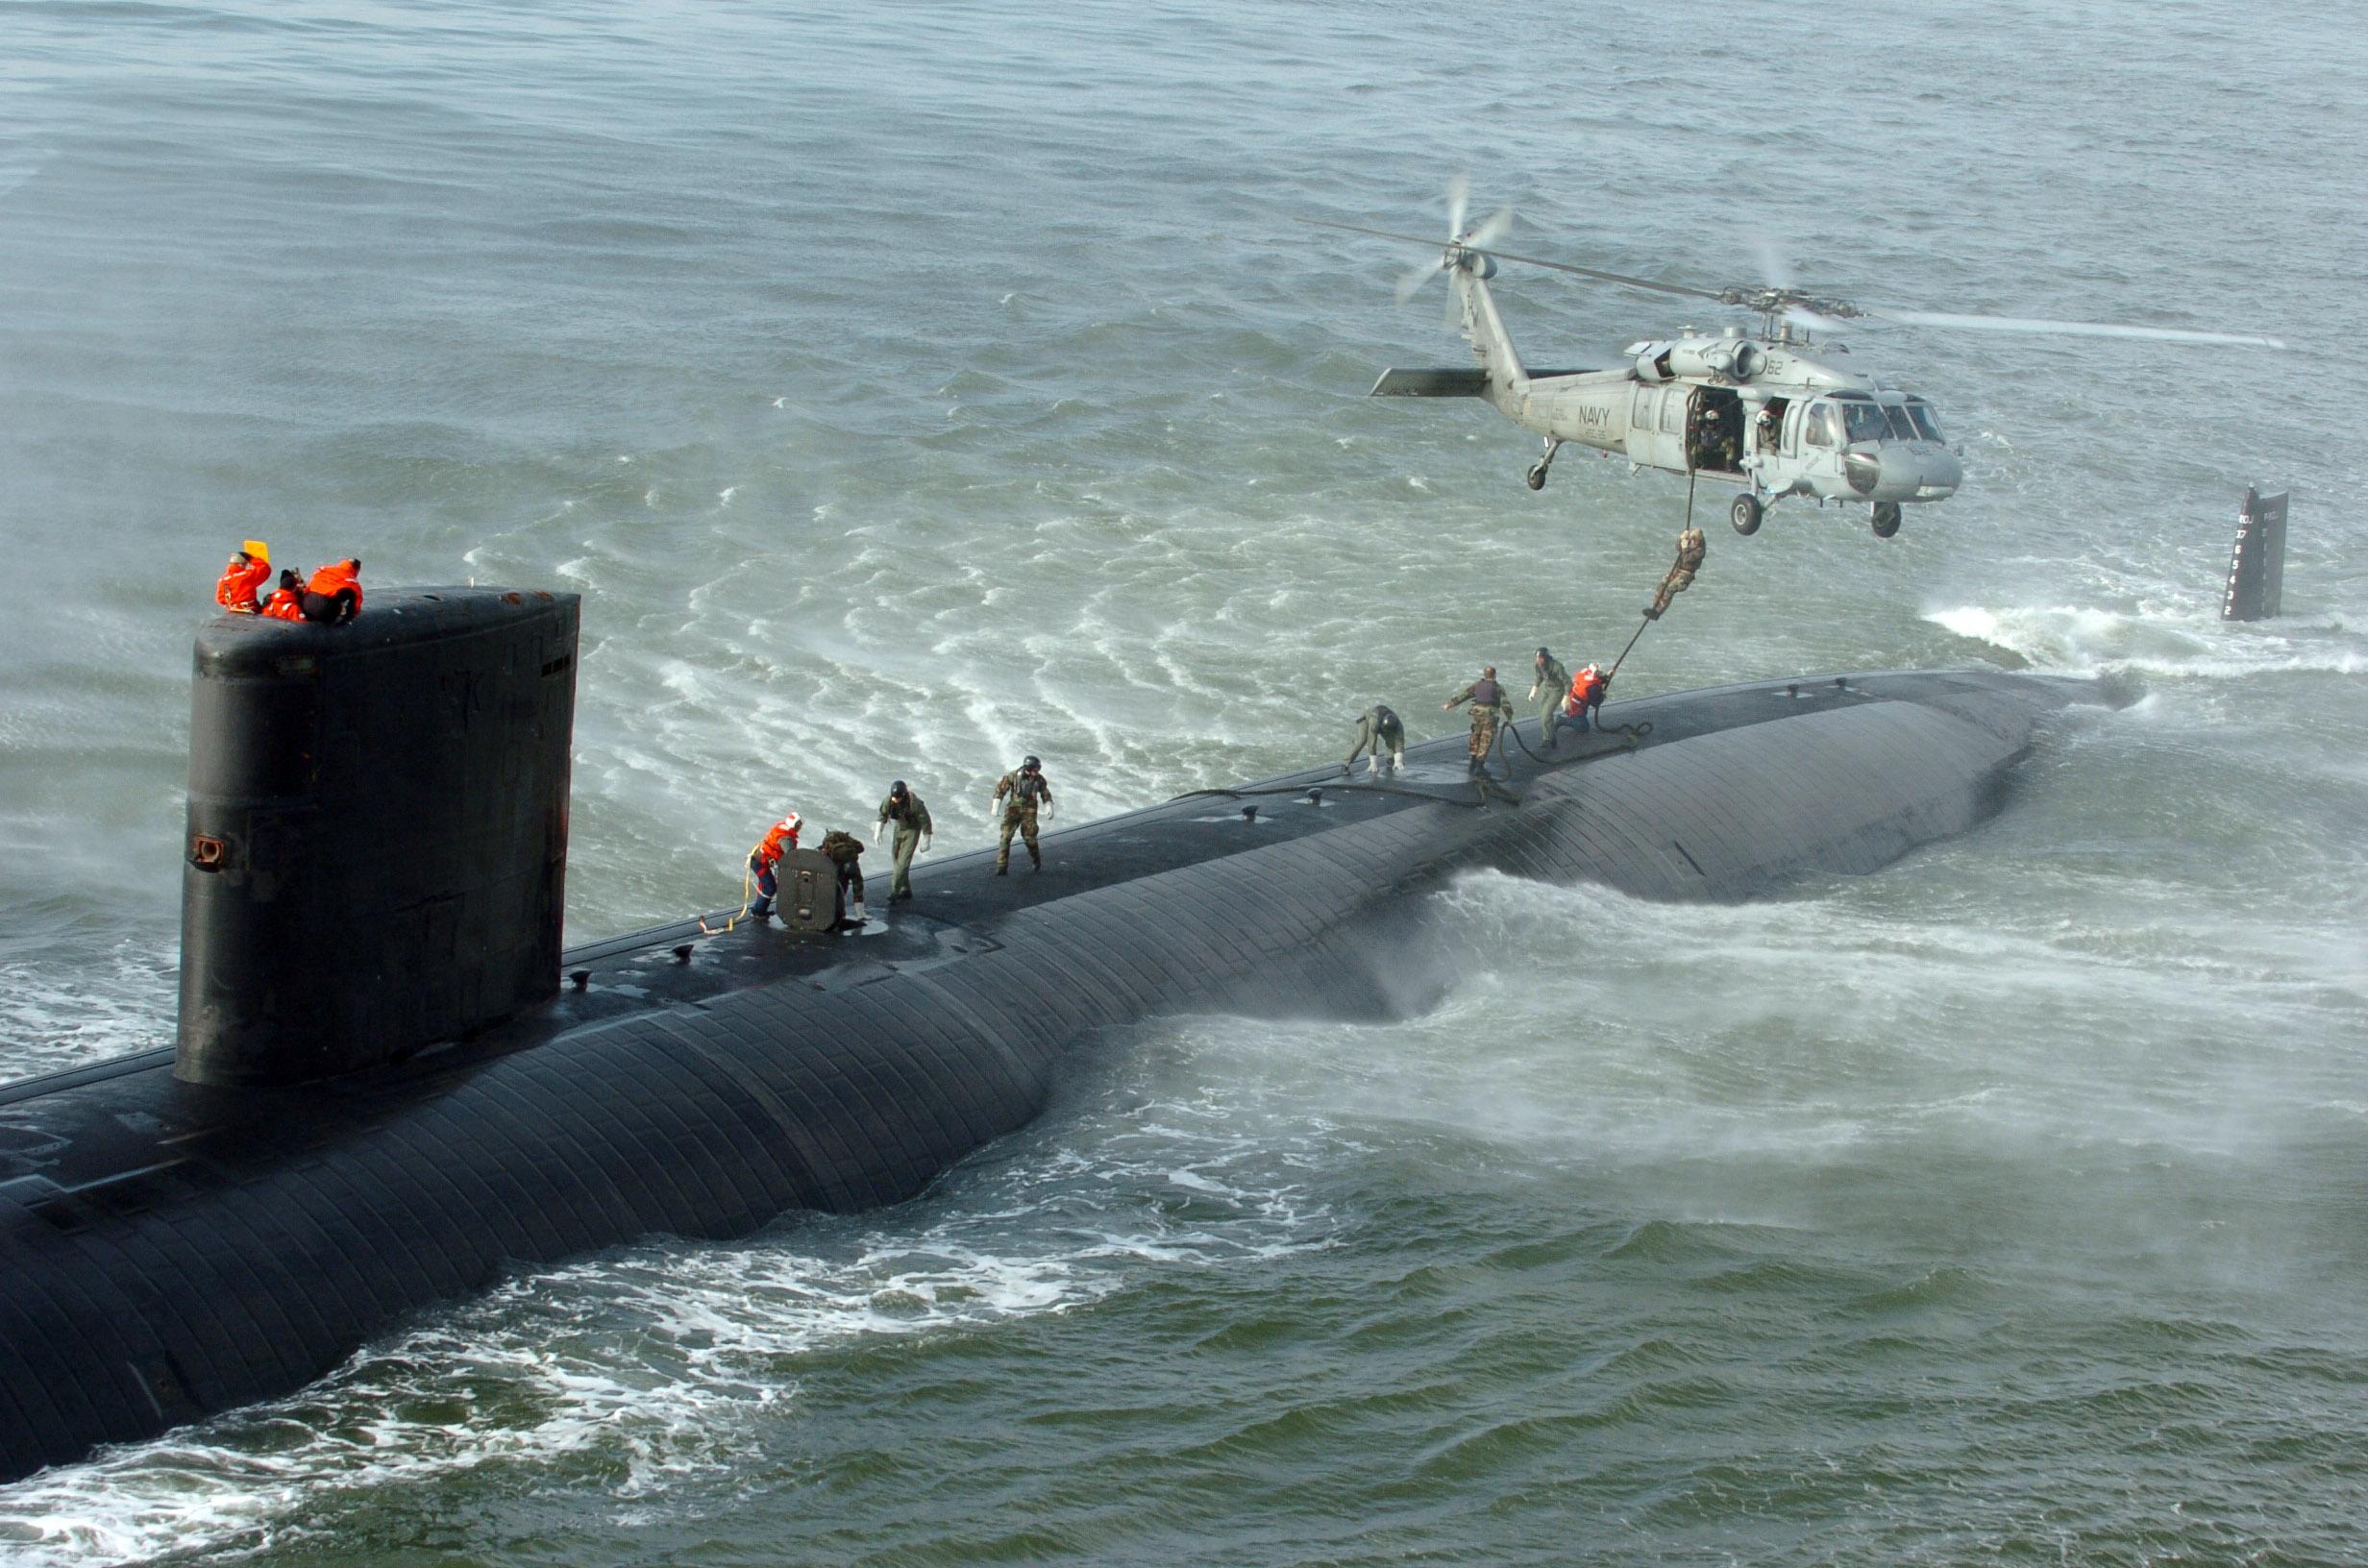 United States Navy SEALs | Military Wiki | FANDOM powered by Wikia